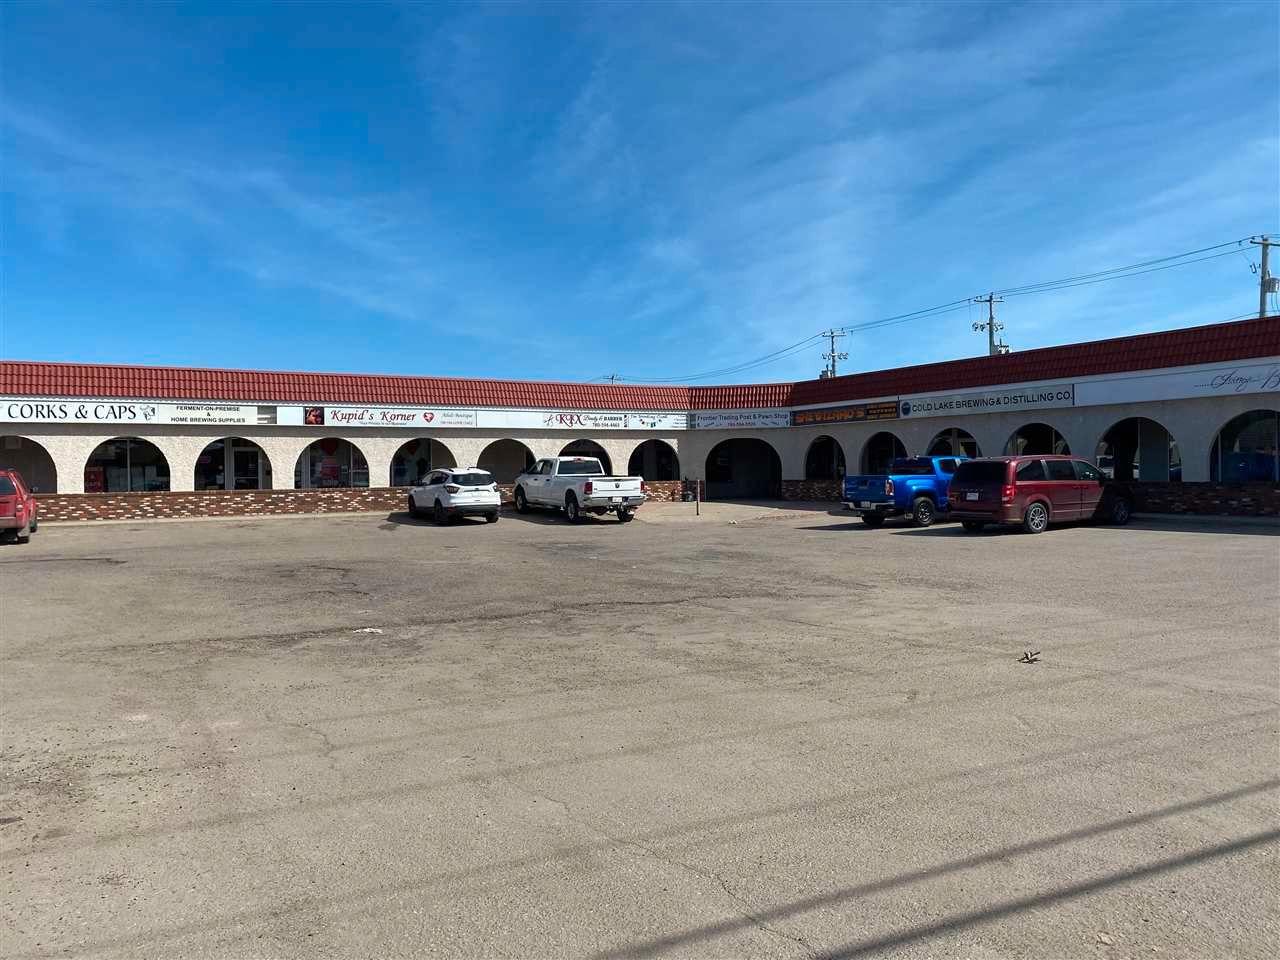 Main Photo: #4 5109 51 Avenue: Cold Lake Retail for sale : MLS®# E4242767